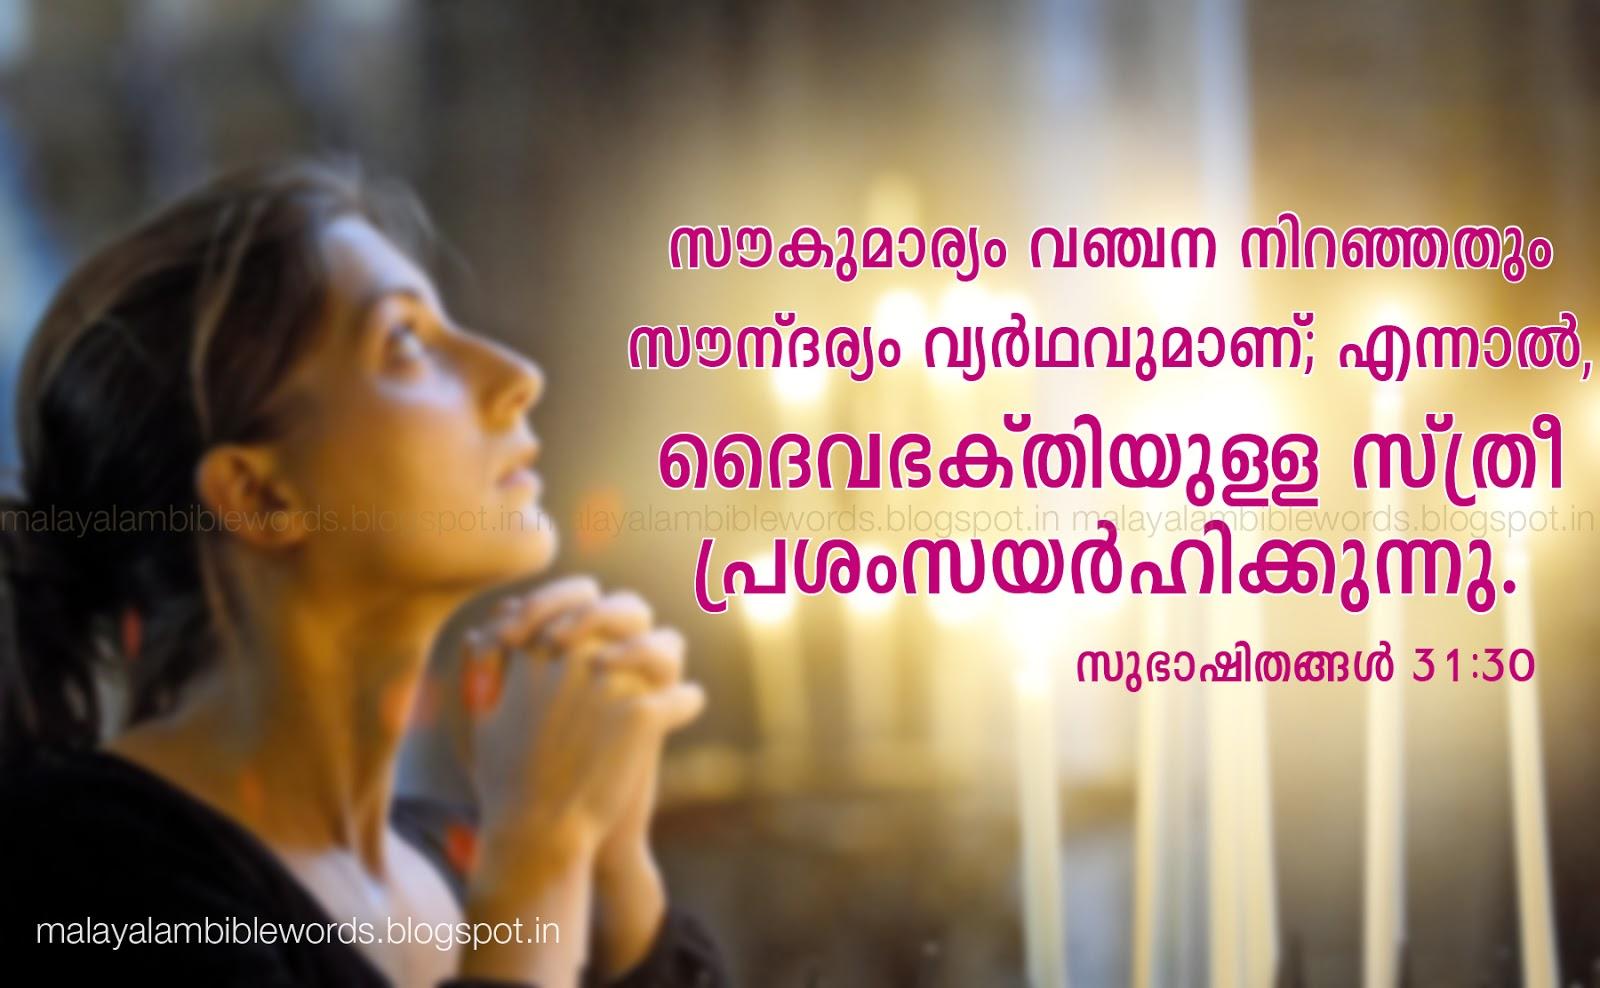 Malayalam bible words proverbs 31 30 malayalam bible - Malayalam bible words images ...